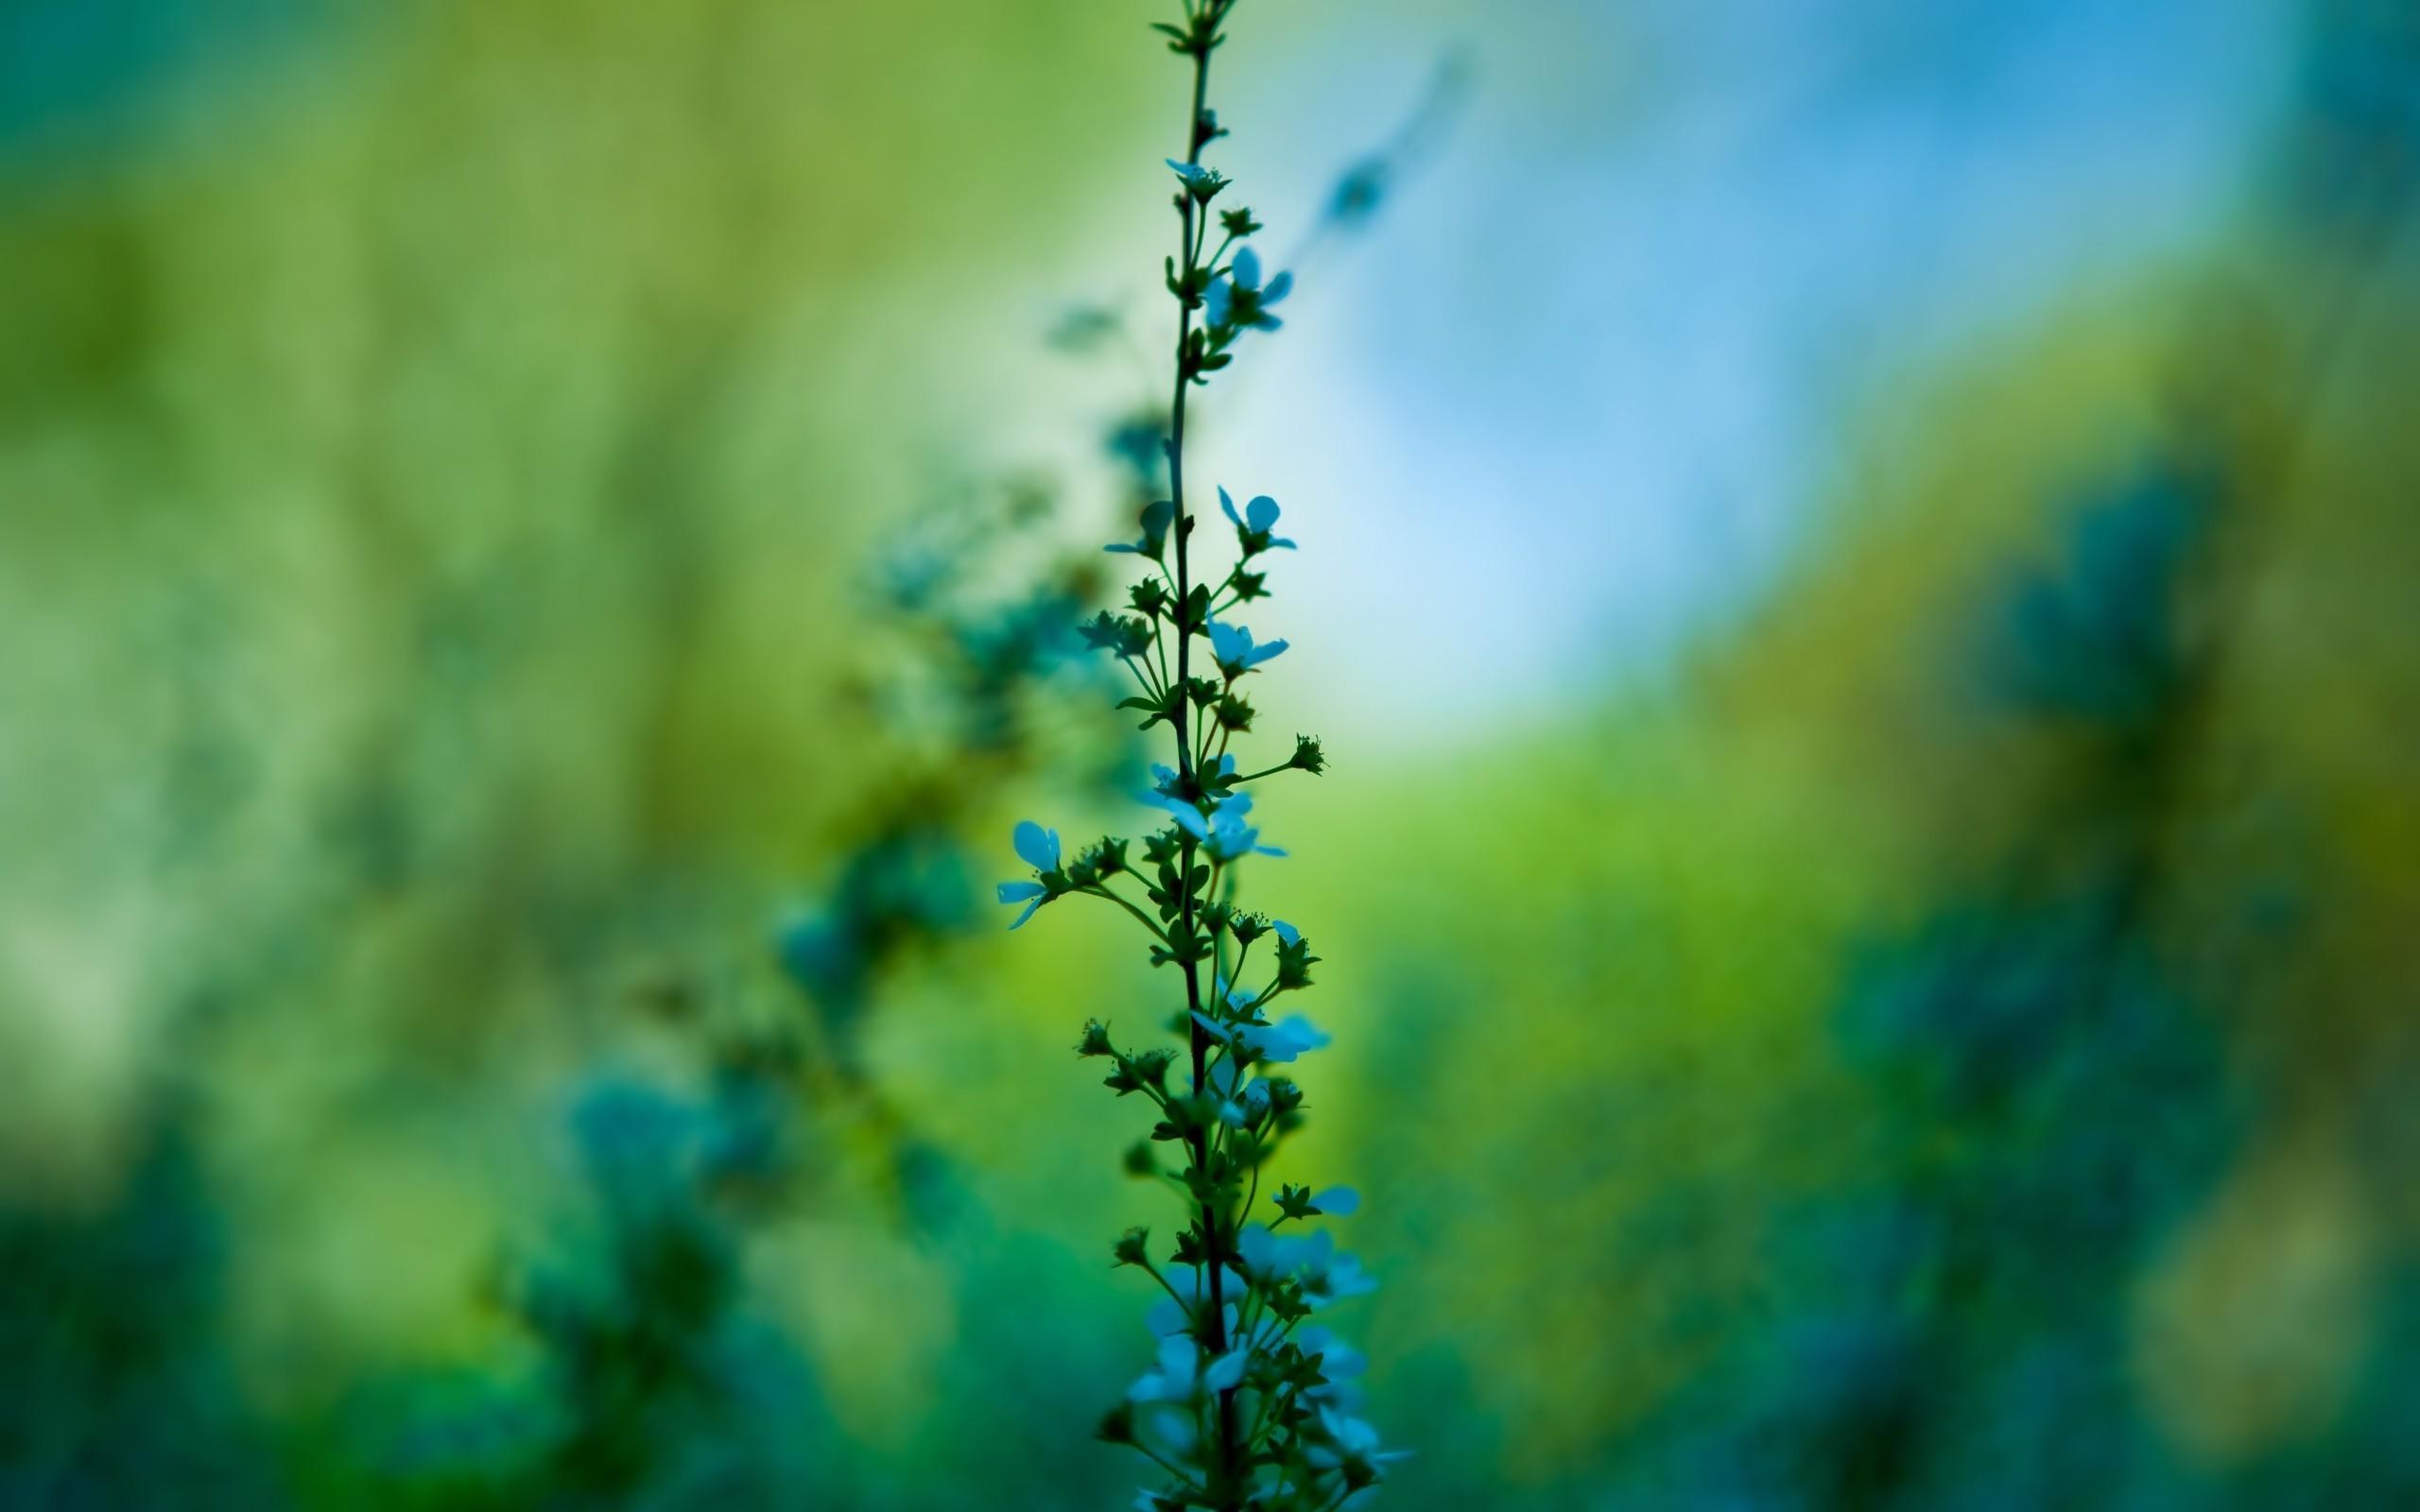 Wallpaper 2560x1600 px blue flowers blurred nature plants 2560x1600 px blue flowers blurred flowers nature plants mightylinksfo